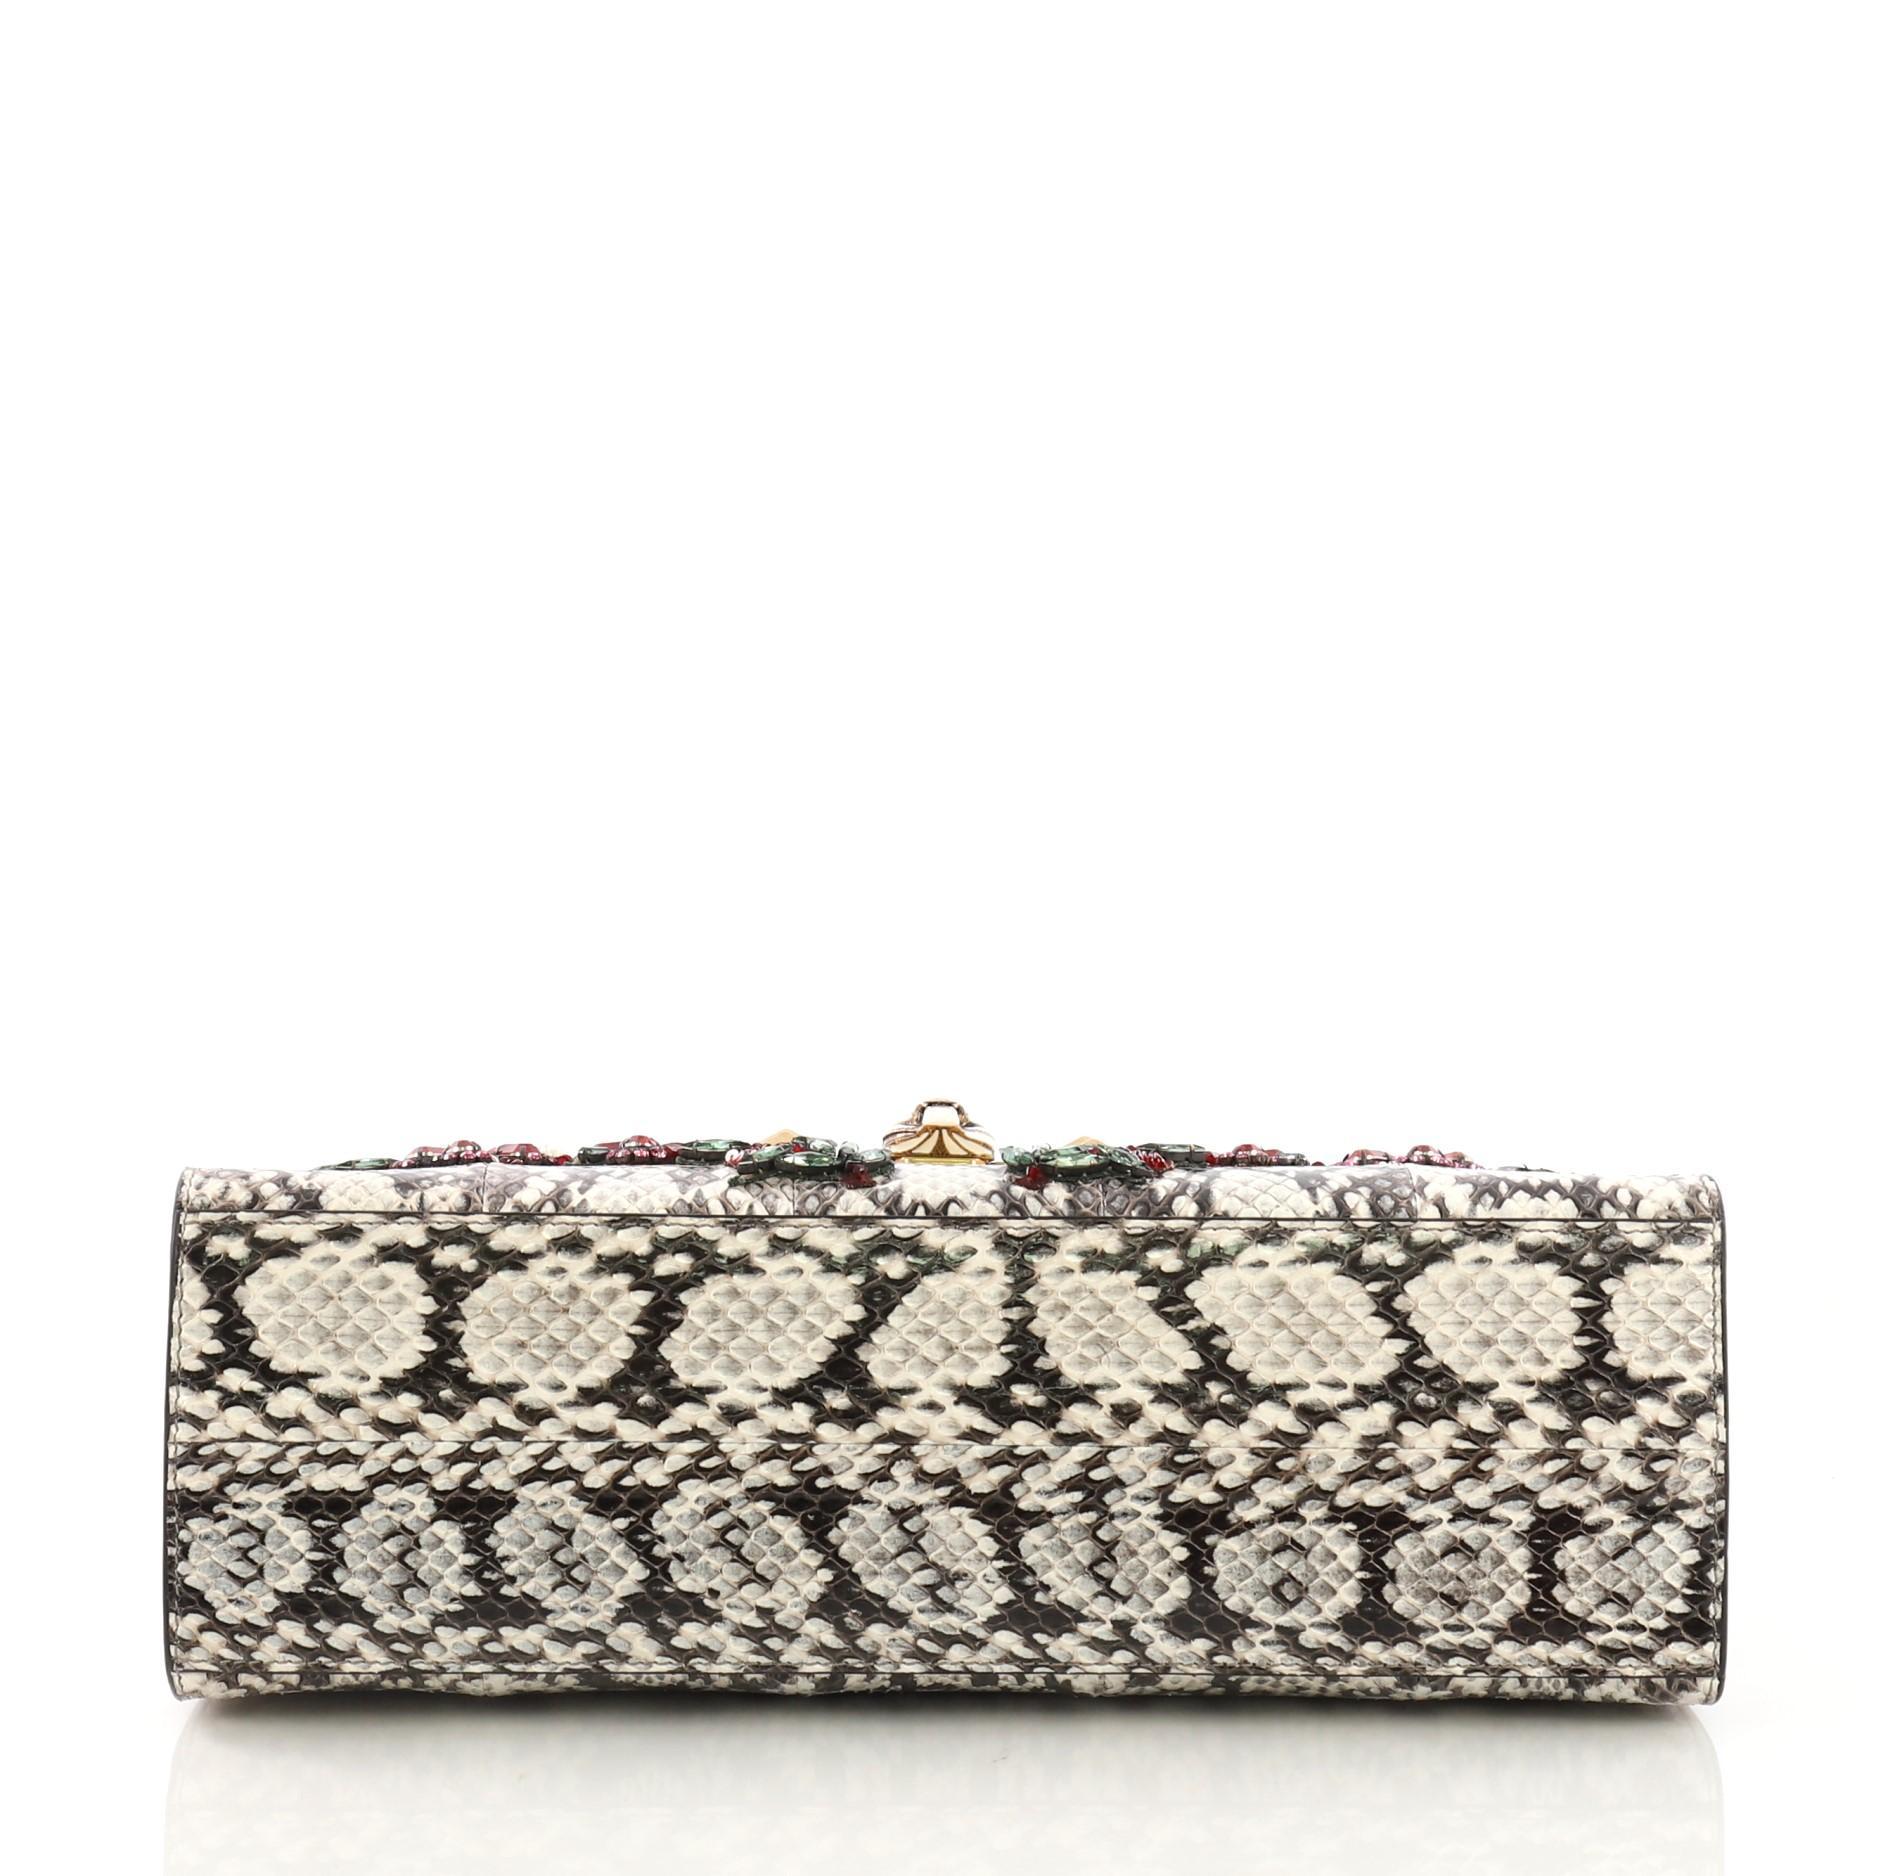 47f2f9bc33 Gucci Osiride Top Handle Bag Embellished Snakeskin Medium at 1stdibs